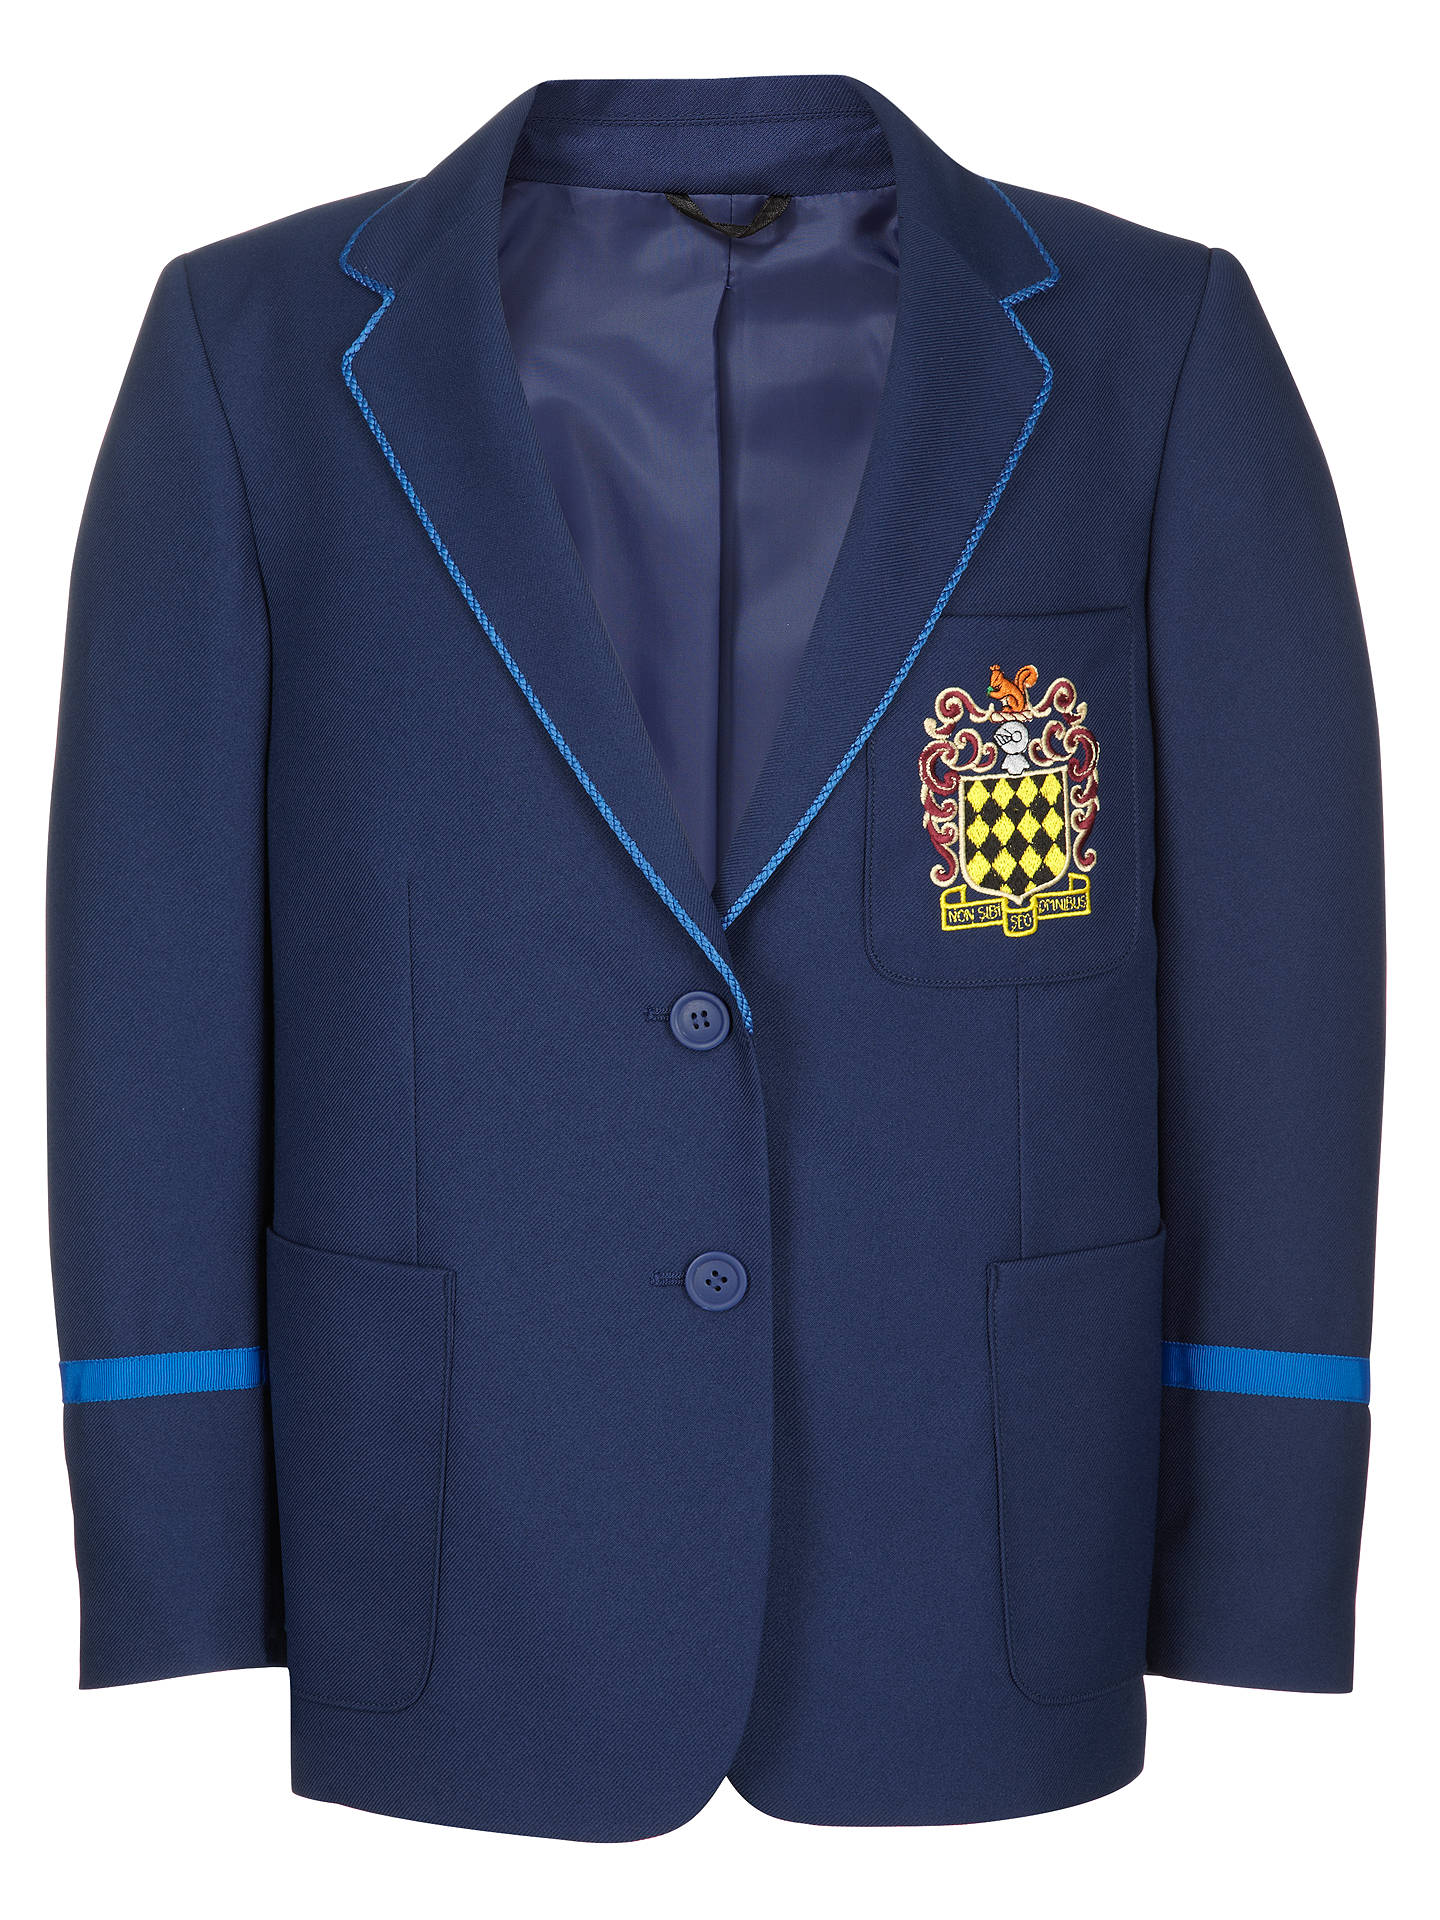 34509ebc9 The Blue Coat School Girls  Blazer